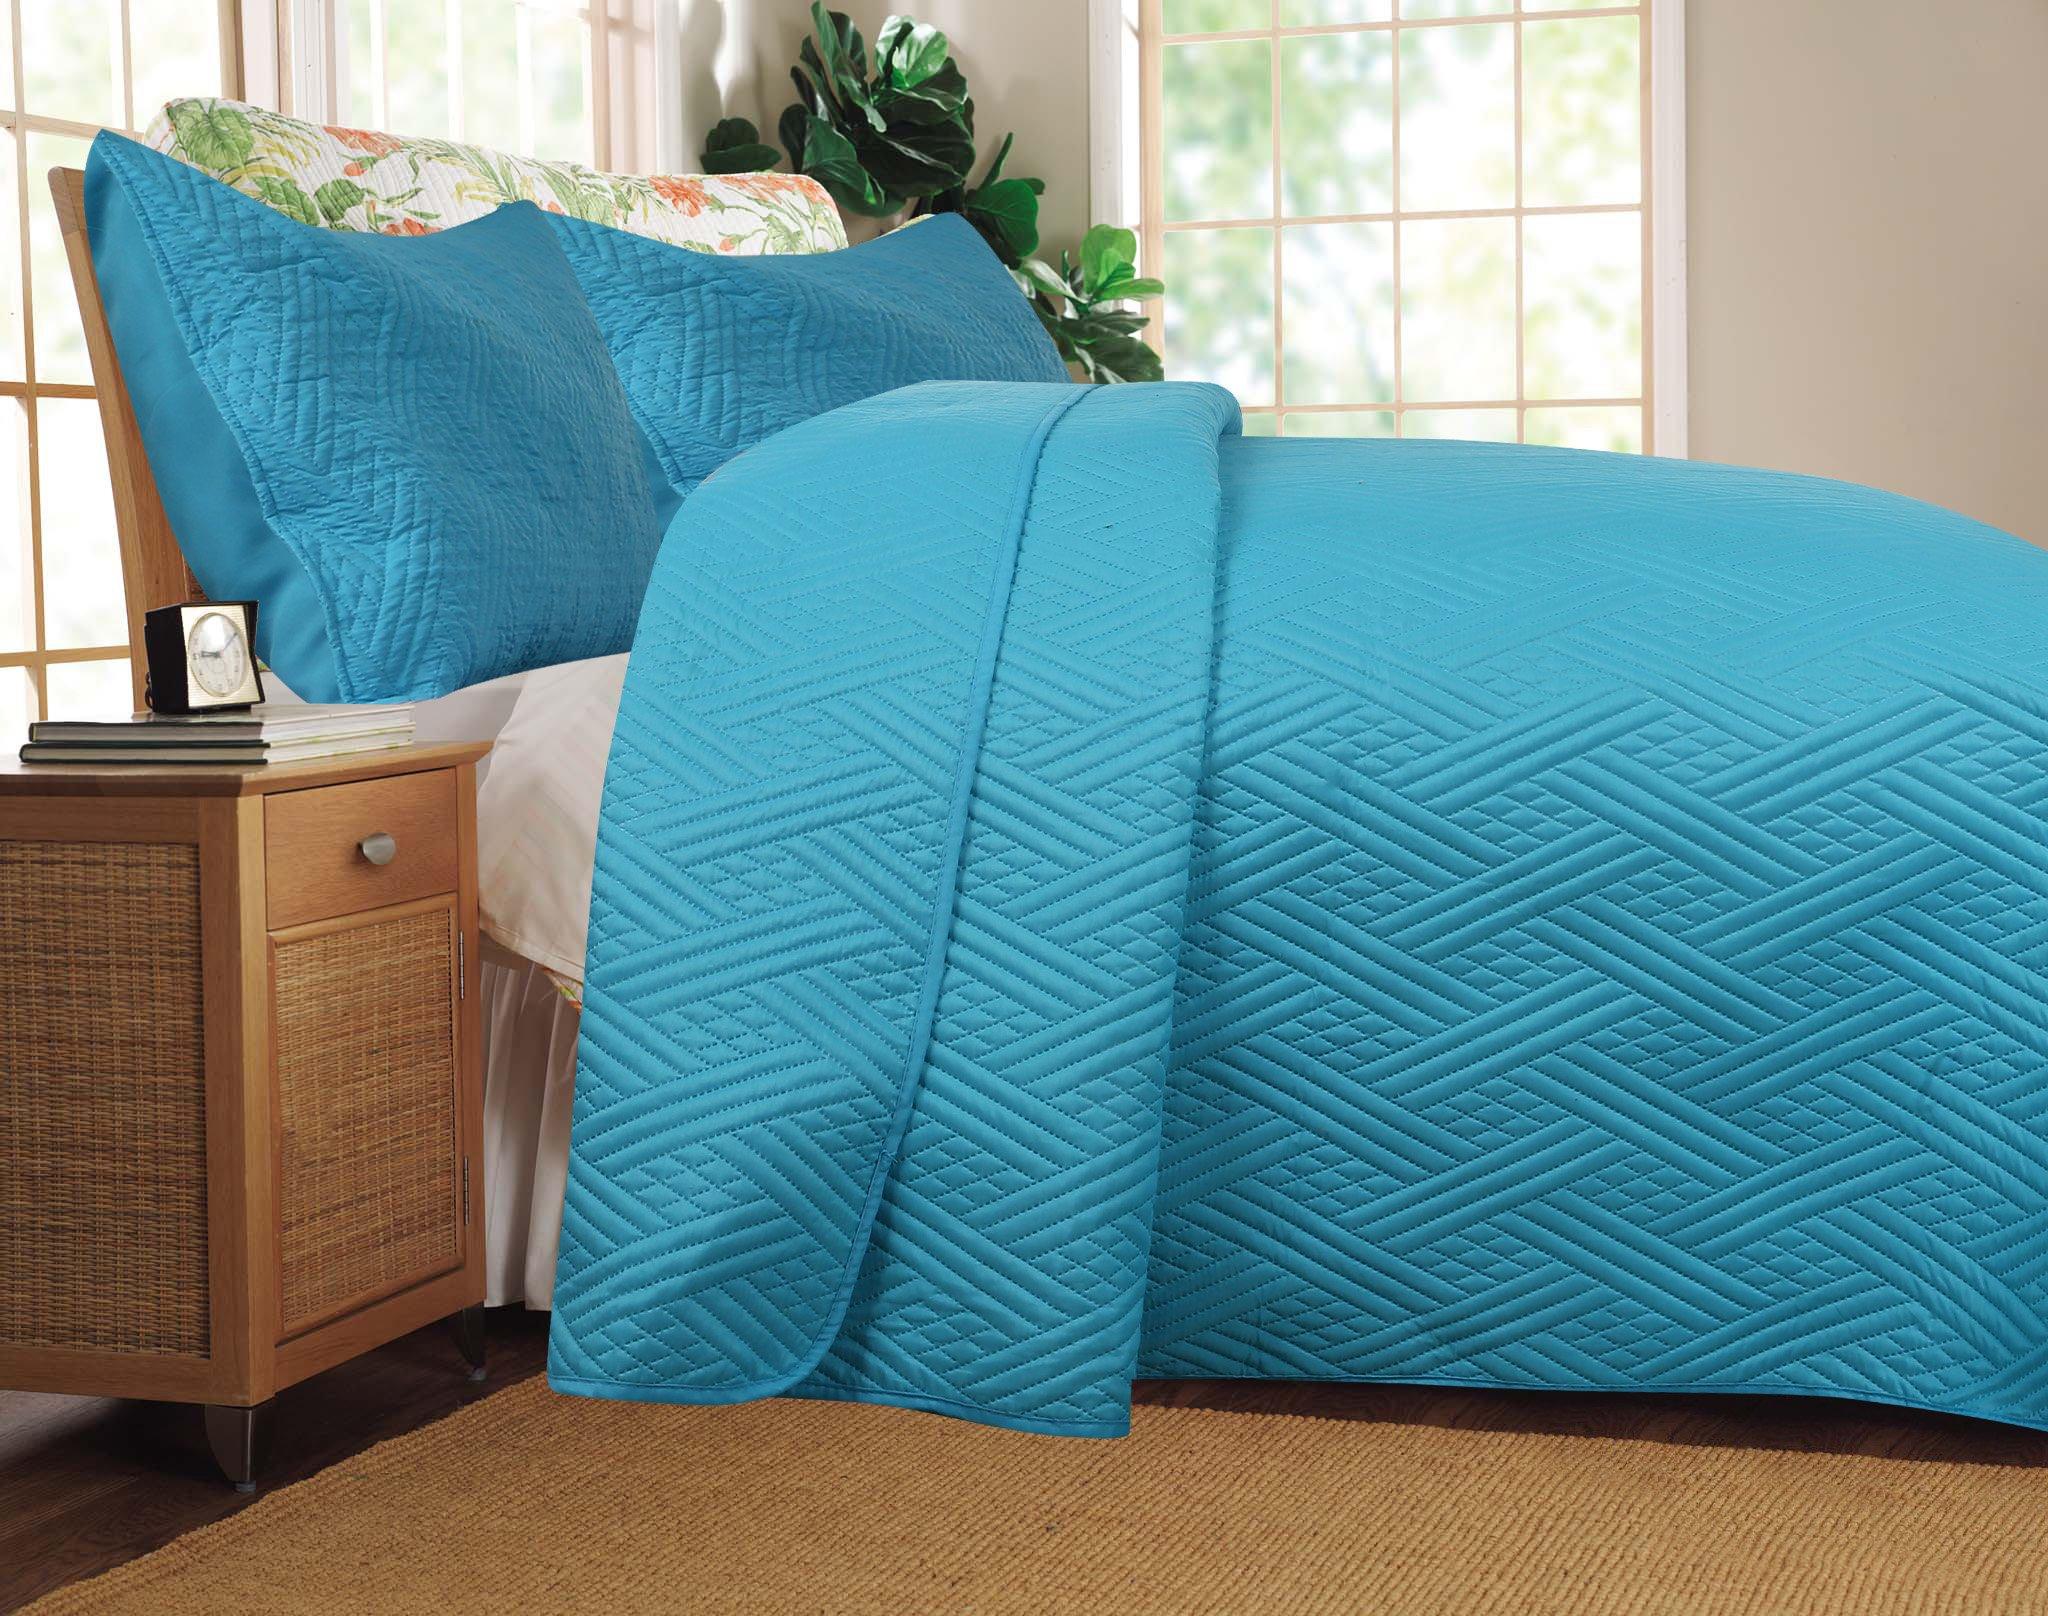 DaDa Bedding 3 Piece Reversible Modern Gentle Wave Bedspread Quilt Set, Queen/95 x 95'', Light Blue